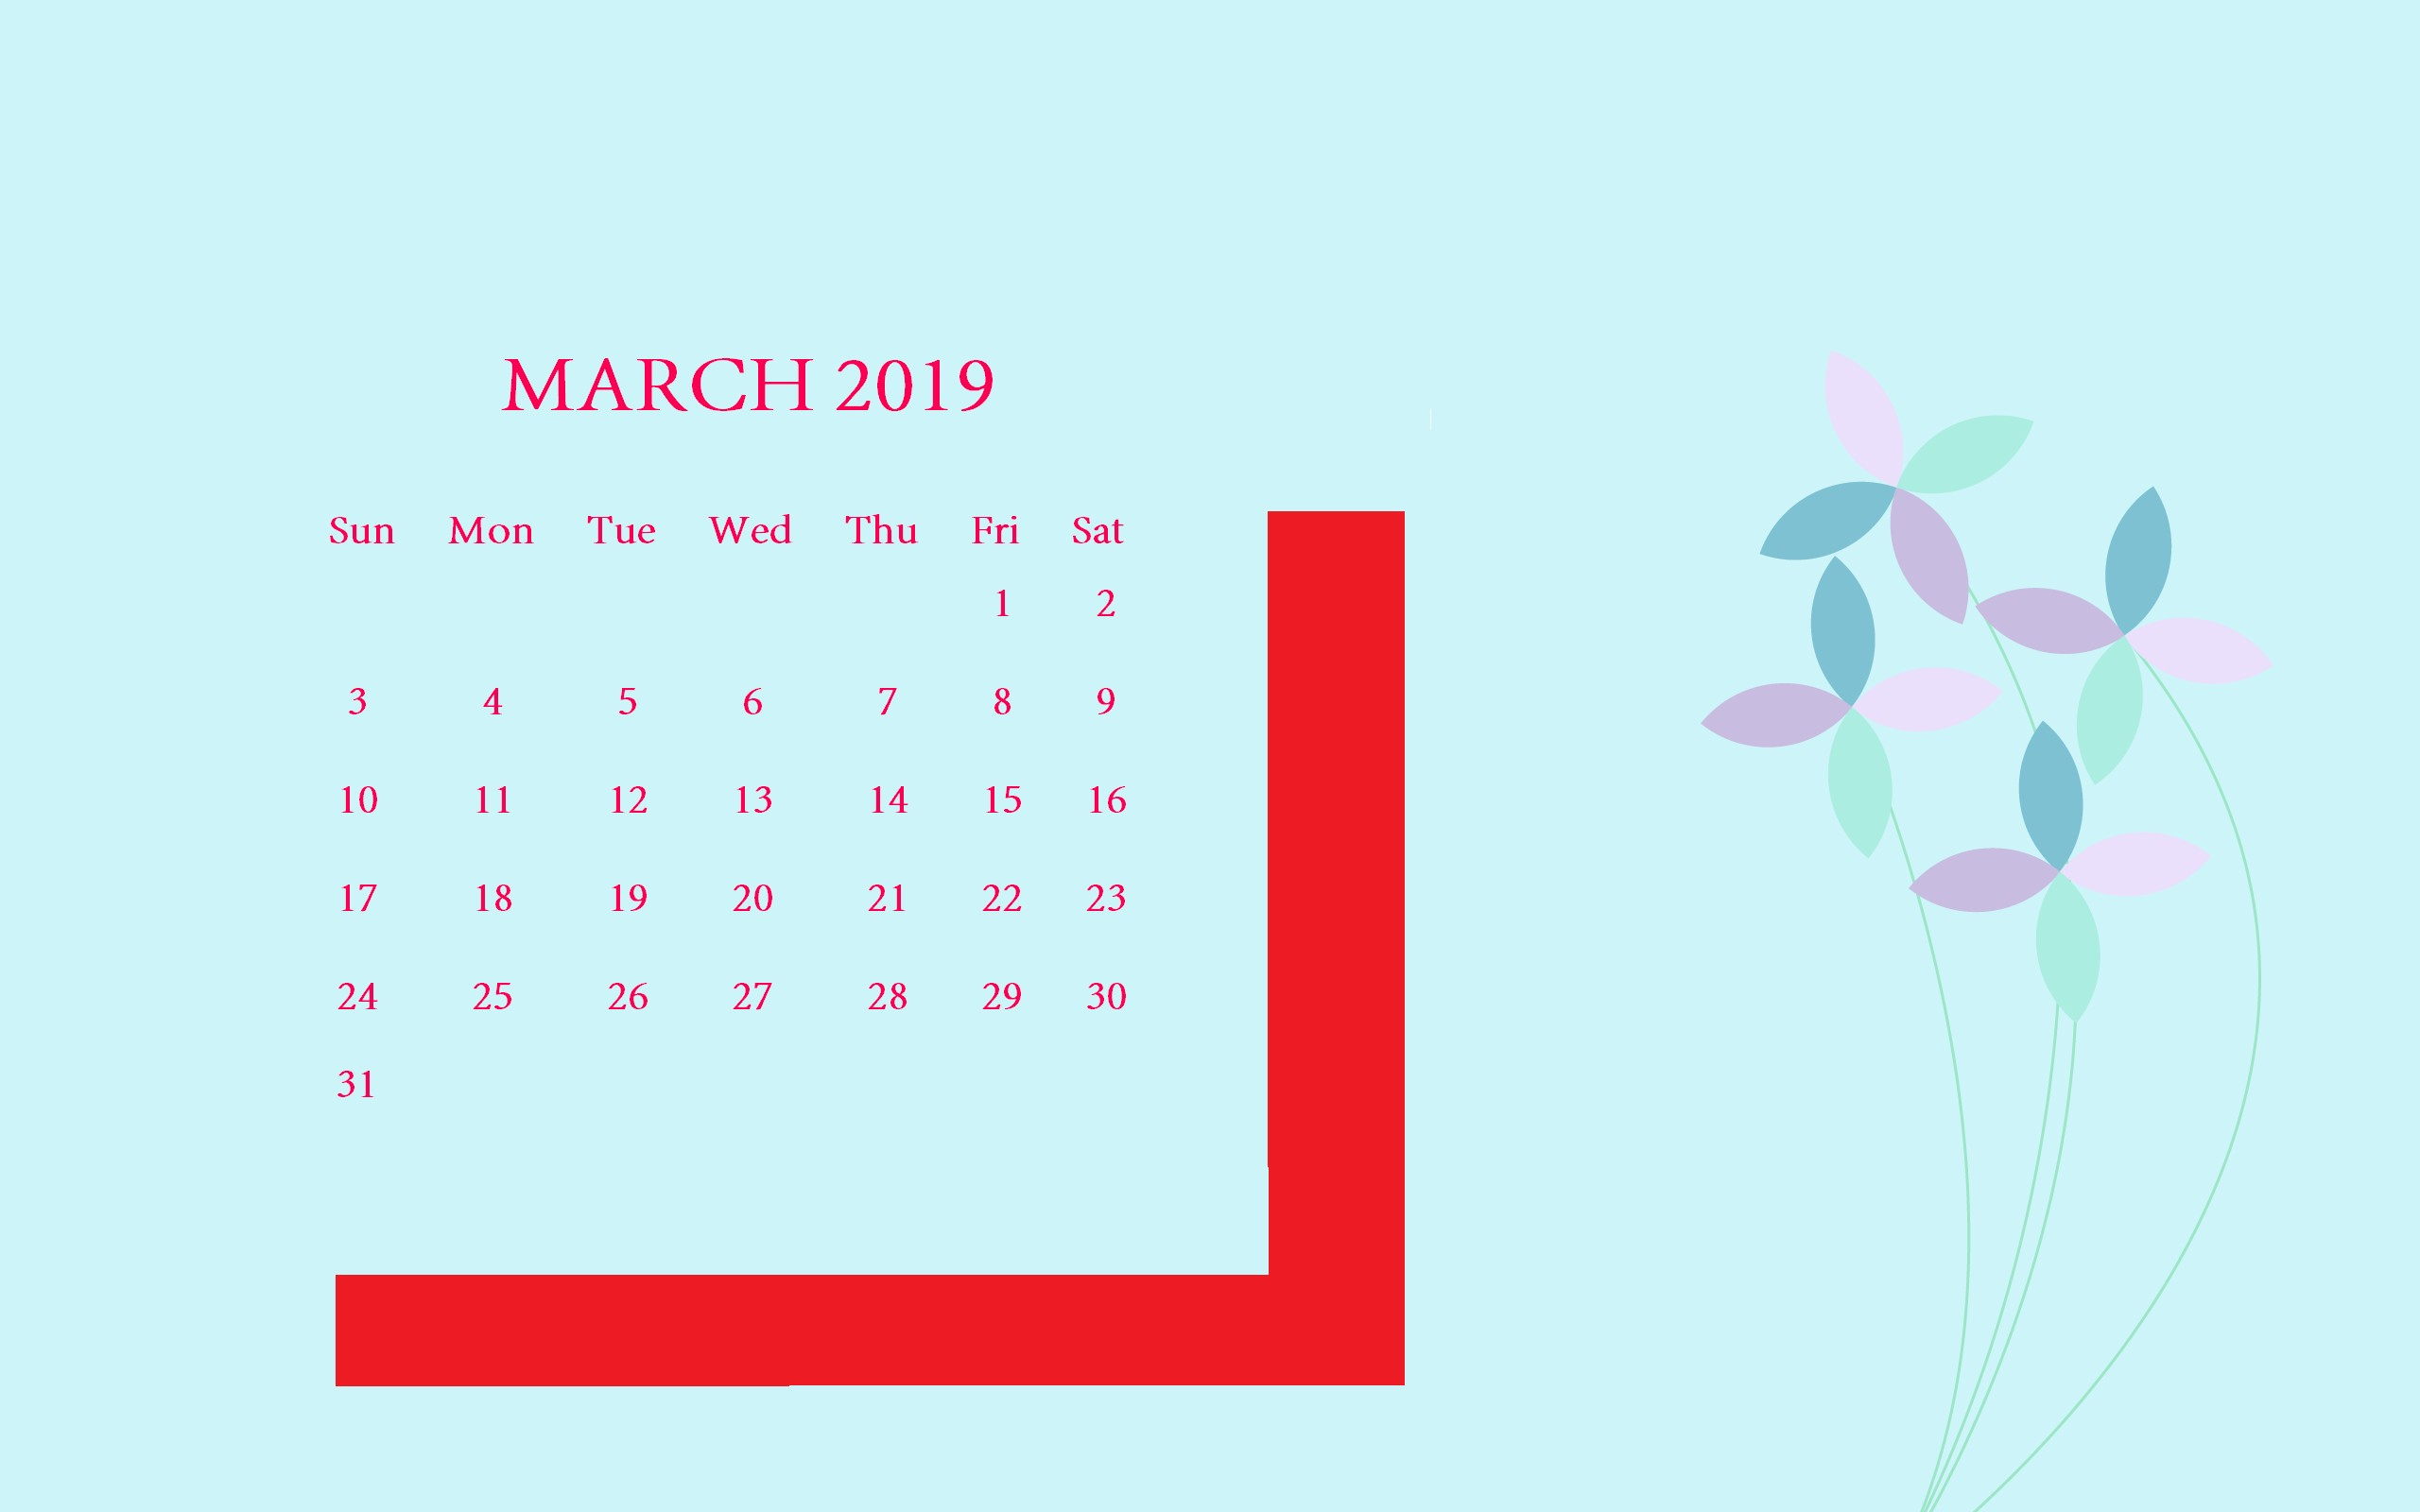 Flowers March 2019 Desktop Calendar march march2019